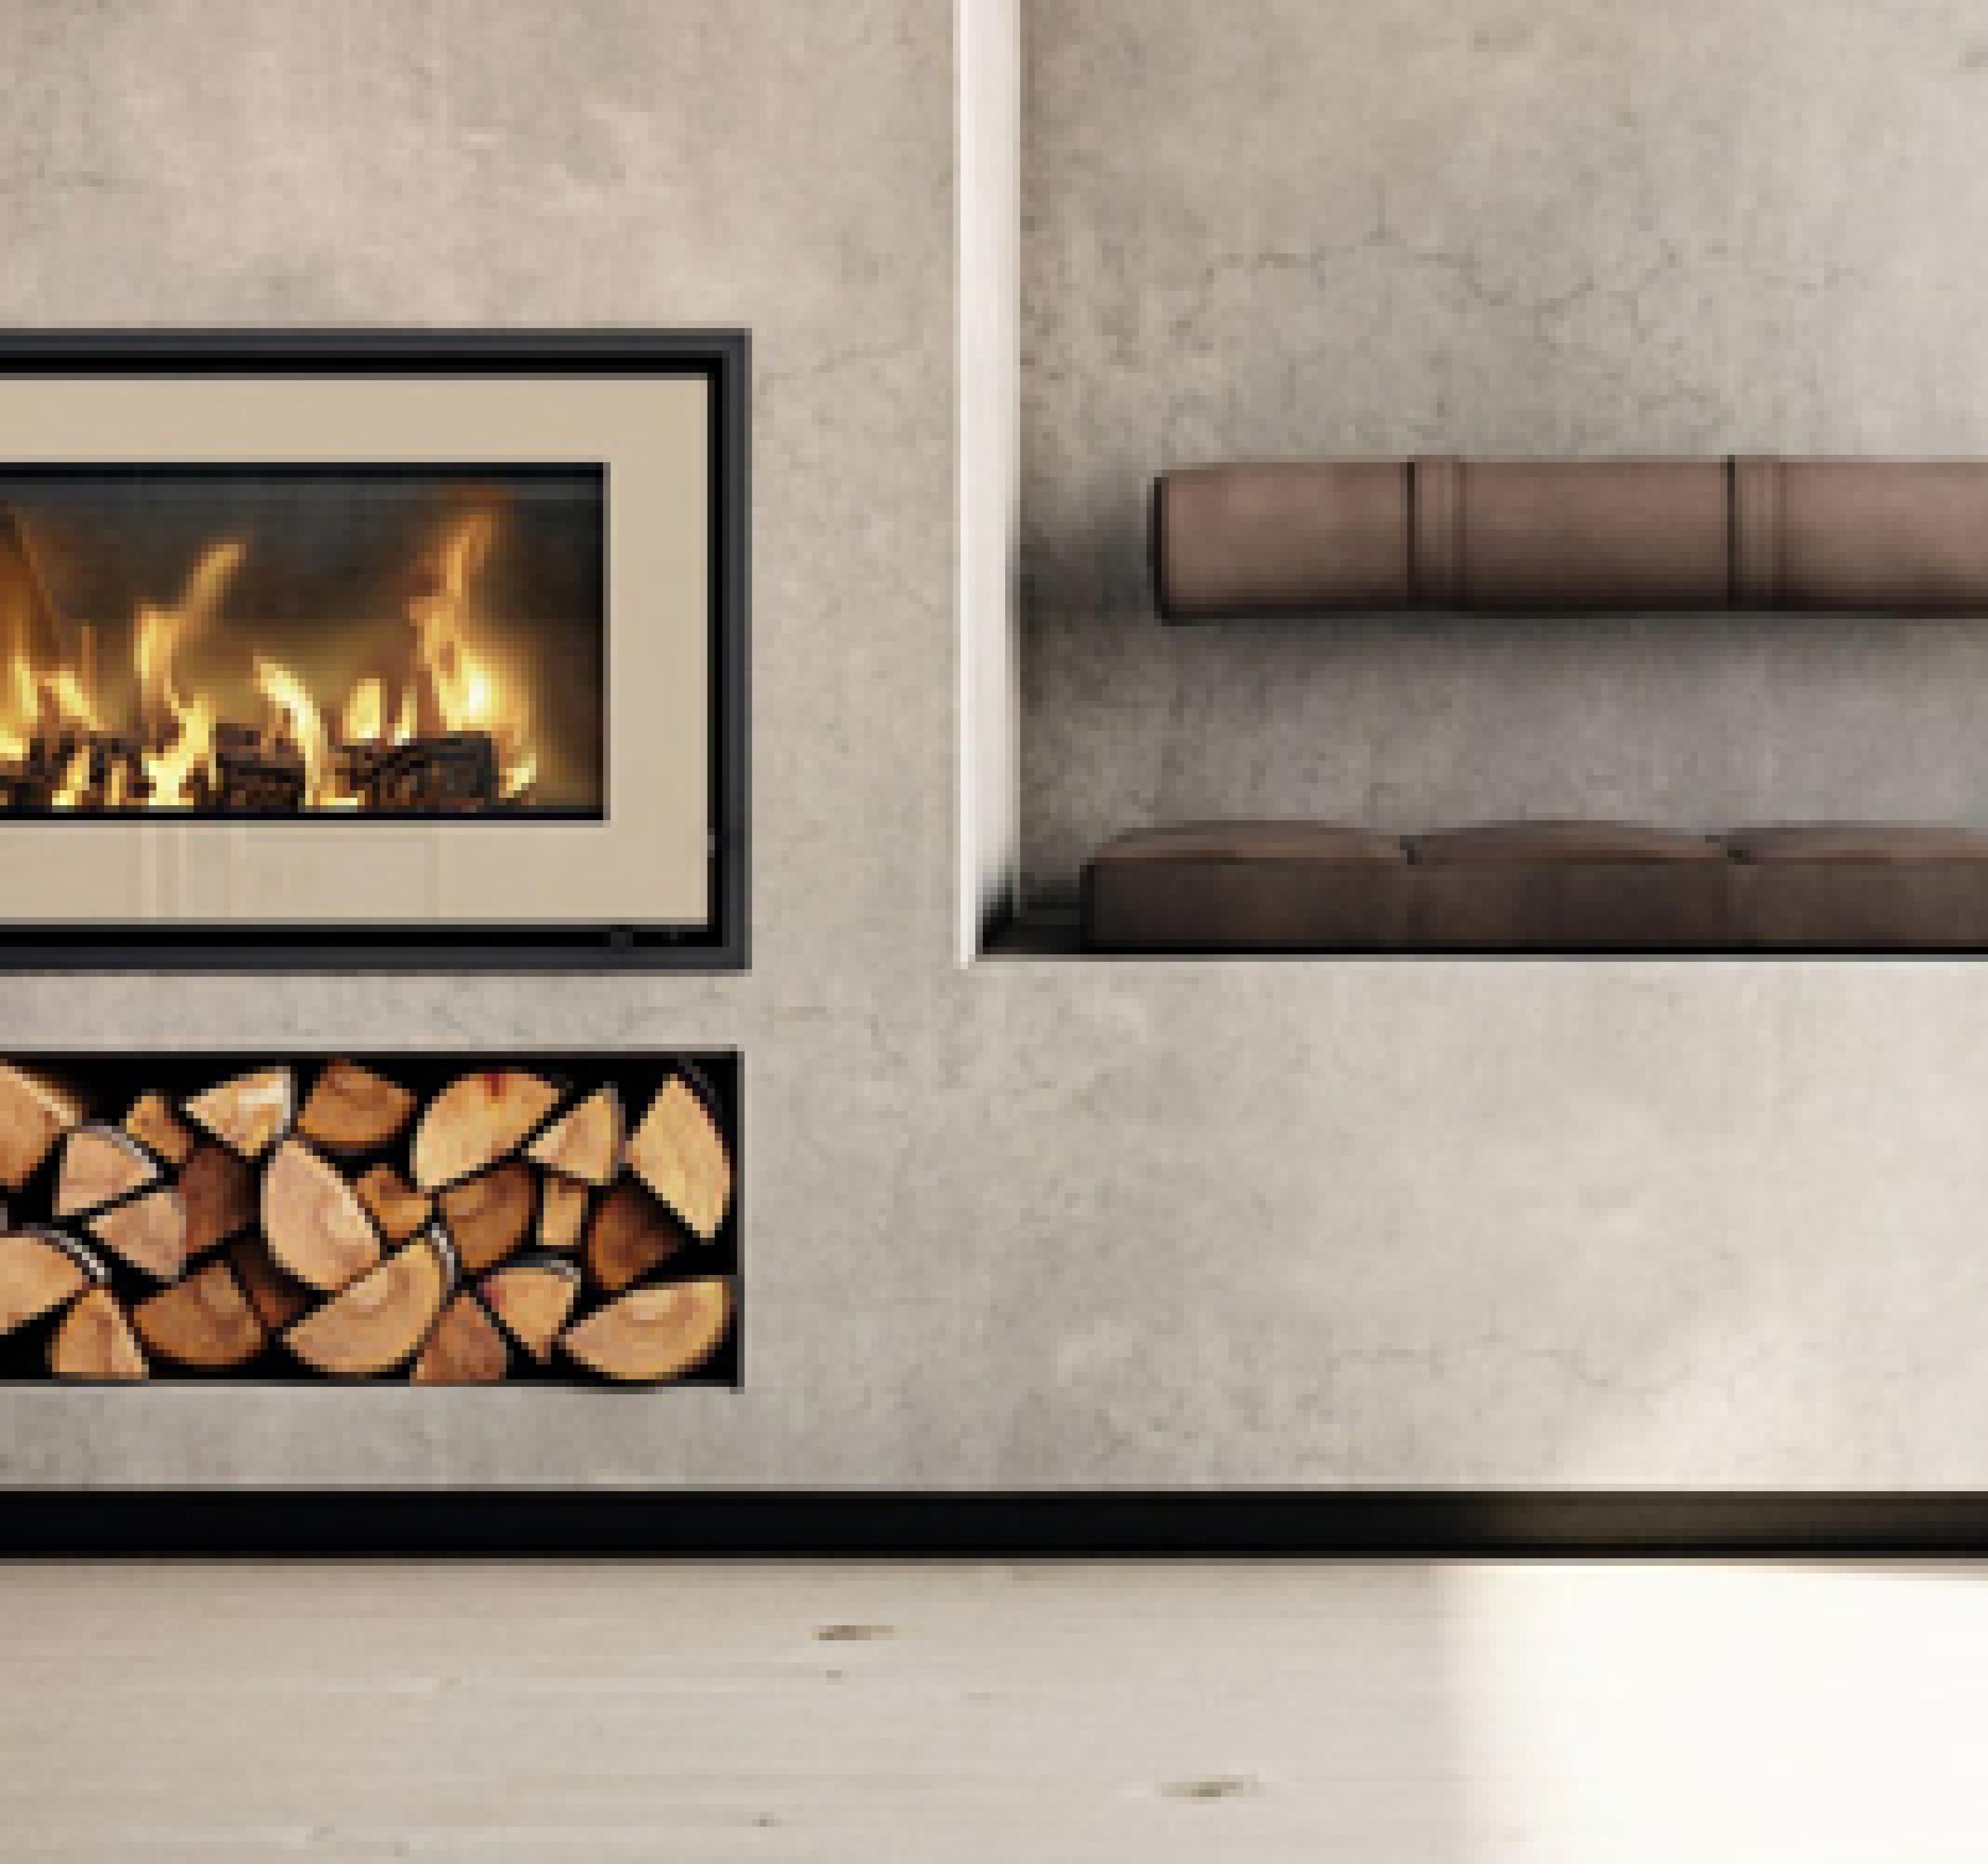 tibas-inbouwhaard-hout-attika-r-700